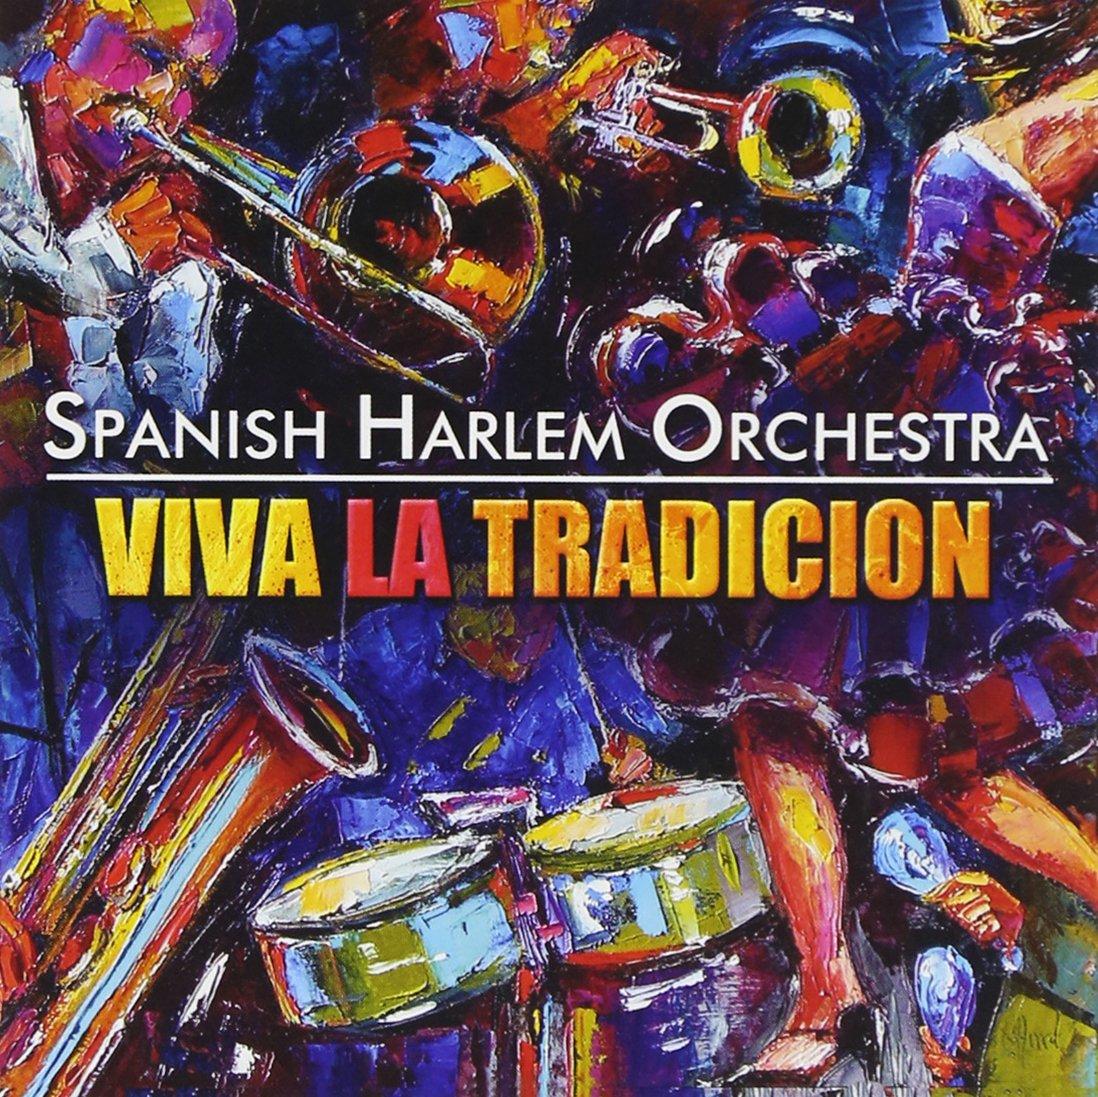 Viva la Tradicion: Spanish Harlem Orchestra: Amazon.es: Música